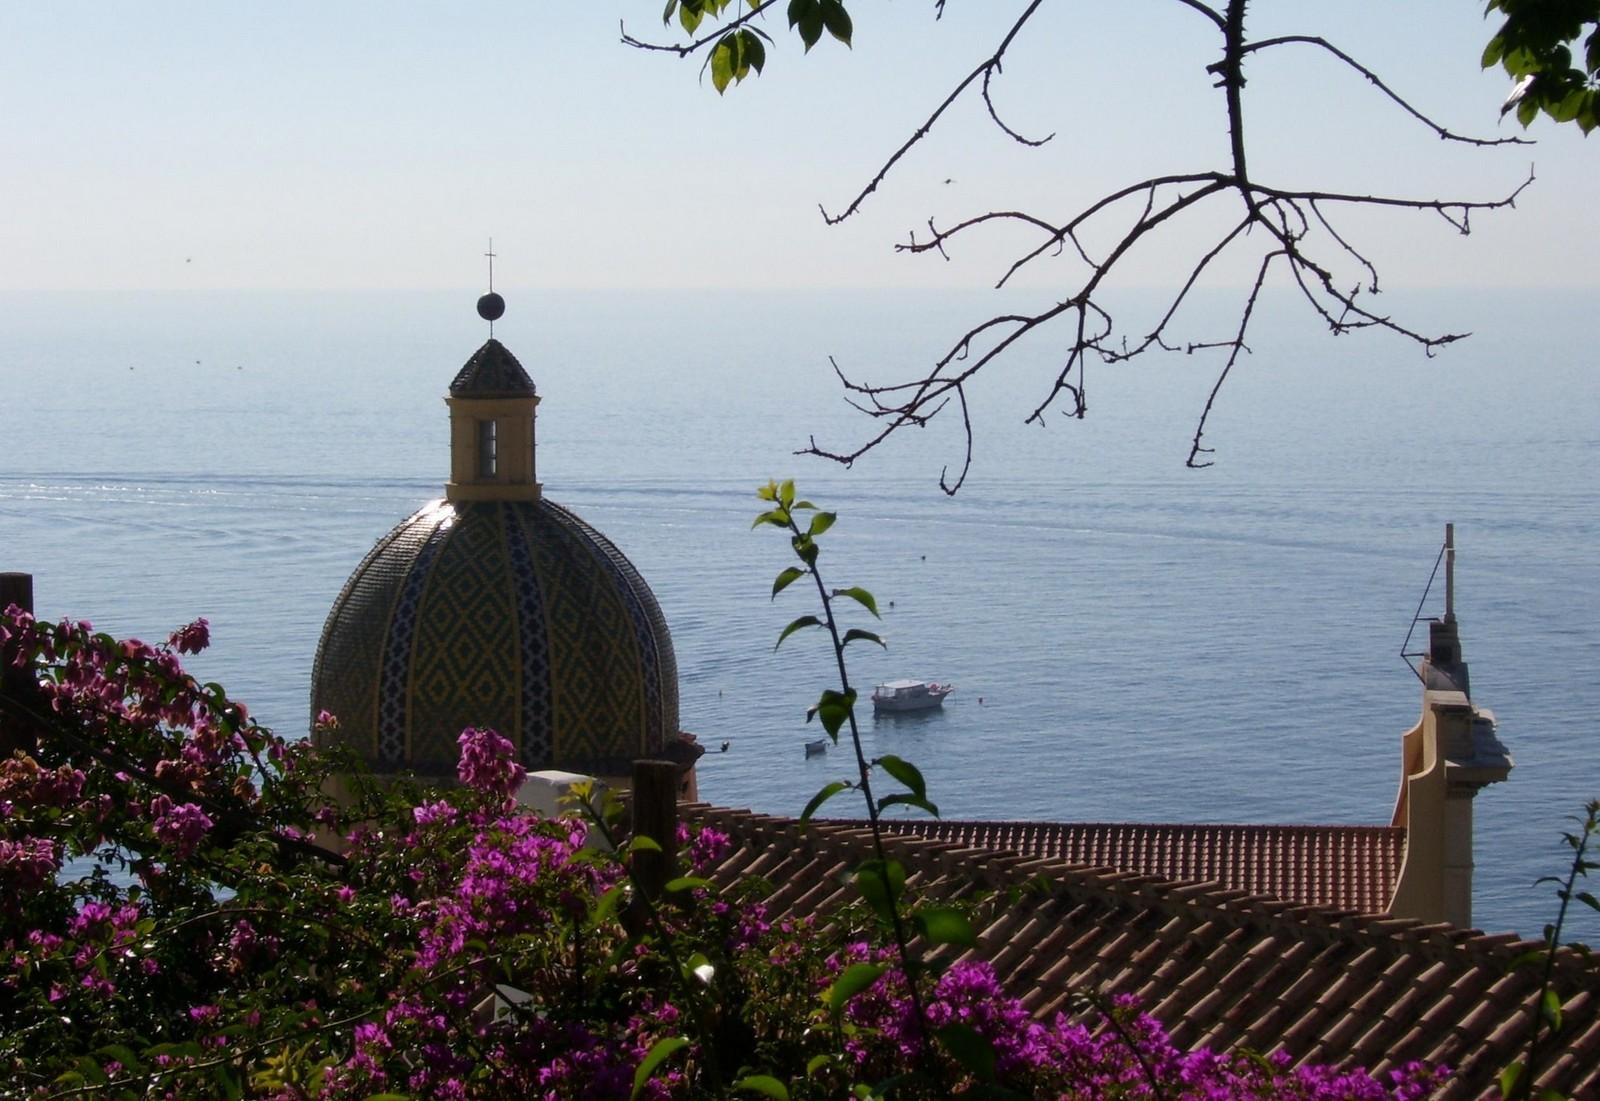 Santa Naria Assunta - Positano an der Amalfitana